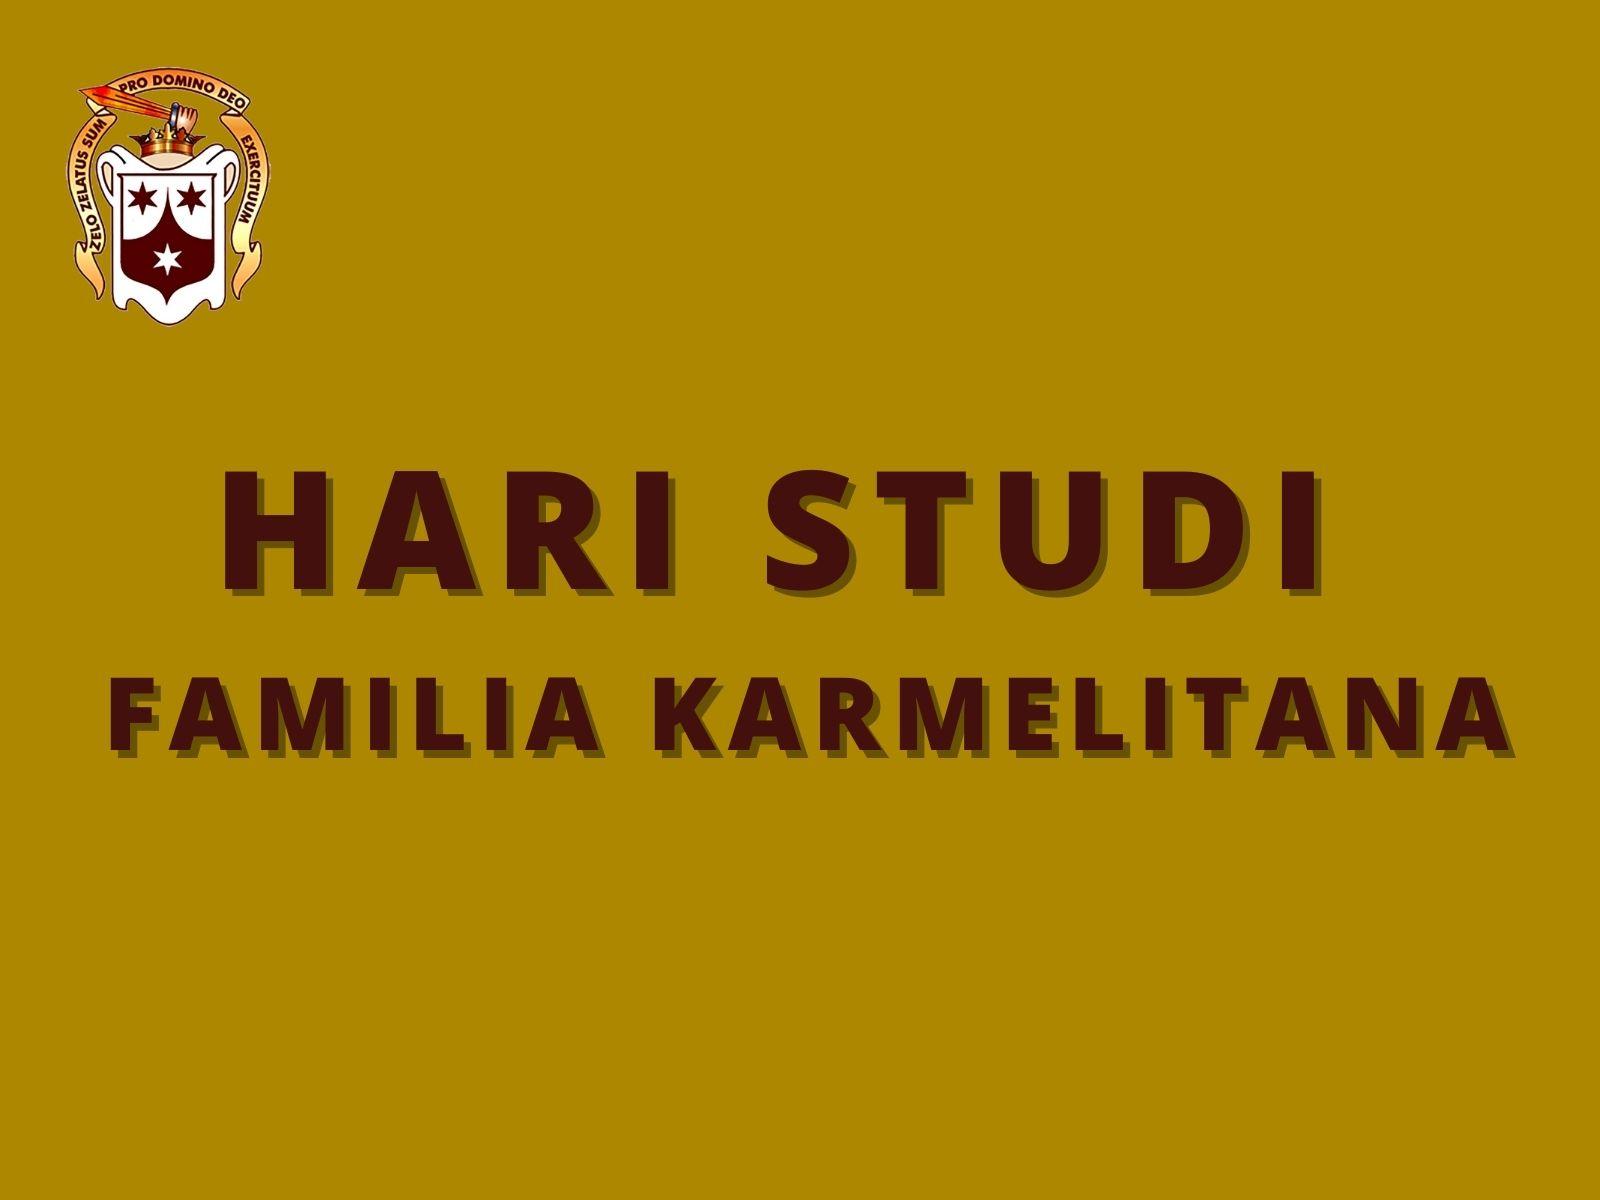 Hari Studi Familia Karmelitana